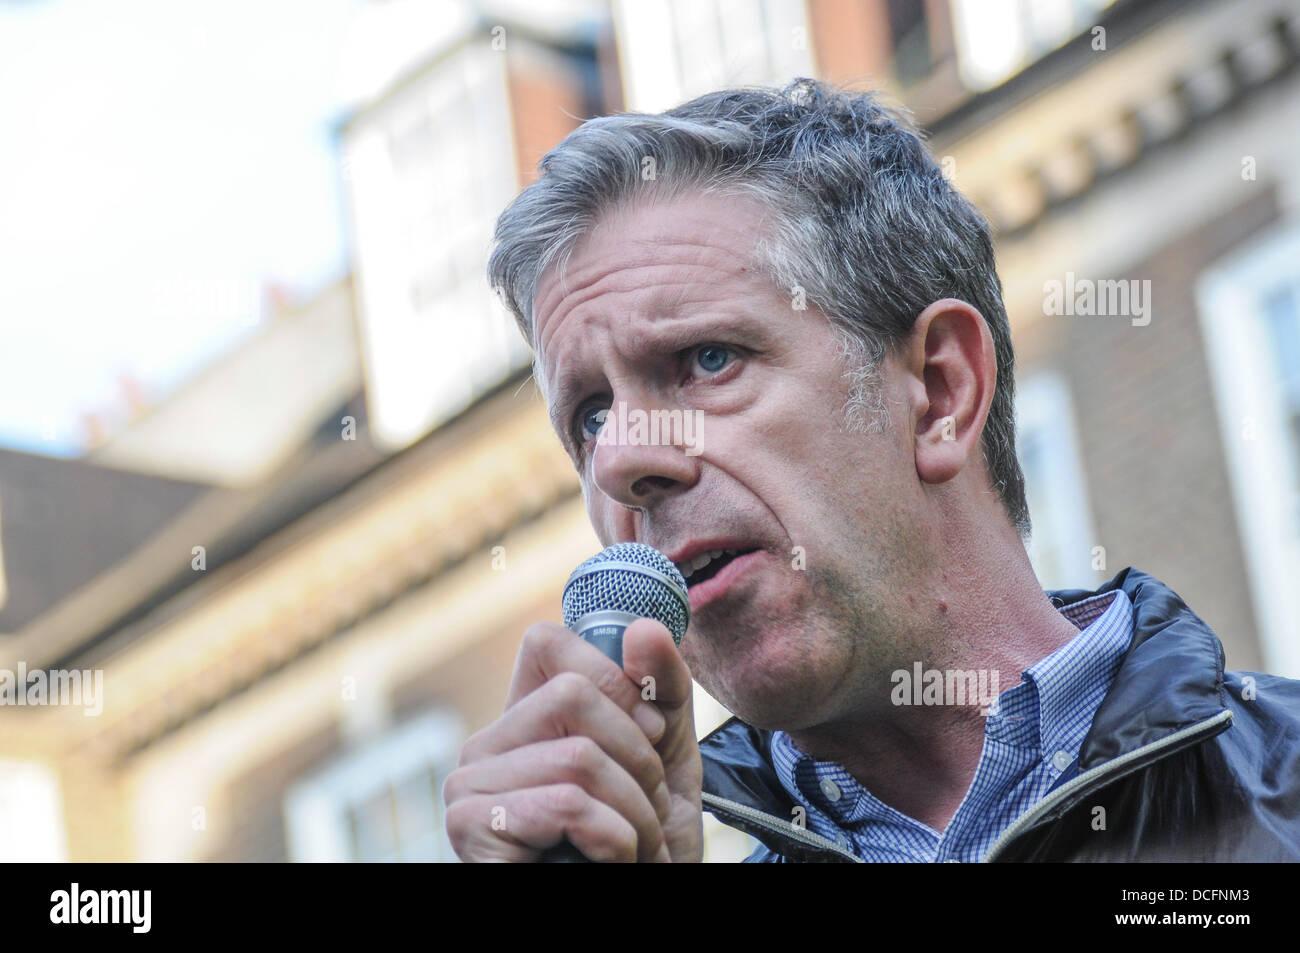 London 16th August 2013 : Chris Nineham speaks <b>Western power</b> want to divided <b>...</b> - london-16th-august-2013-chris-nineham-speaks-western-power-want-to-DCFNM3